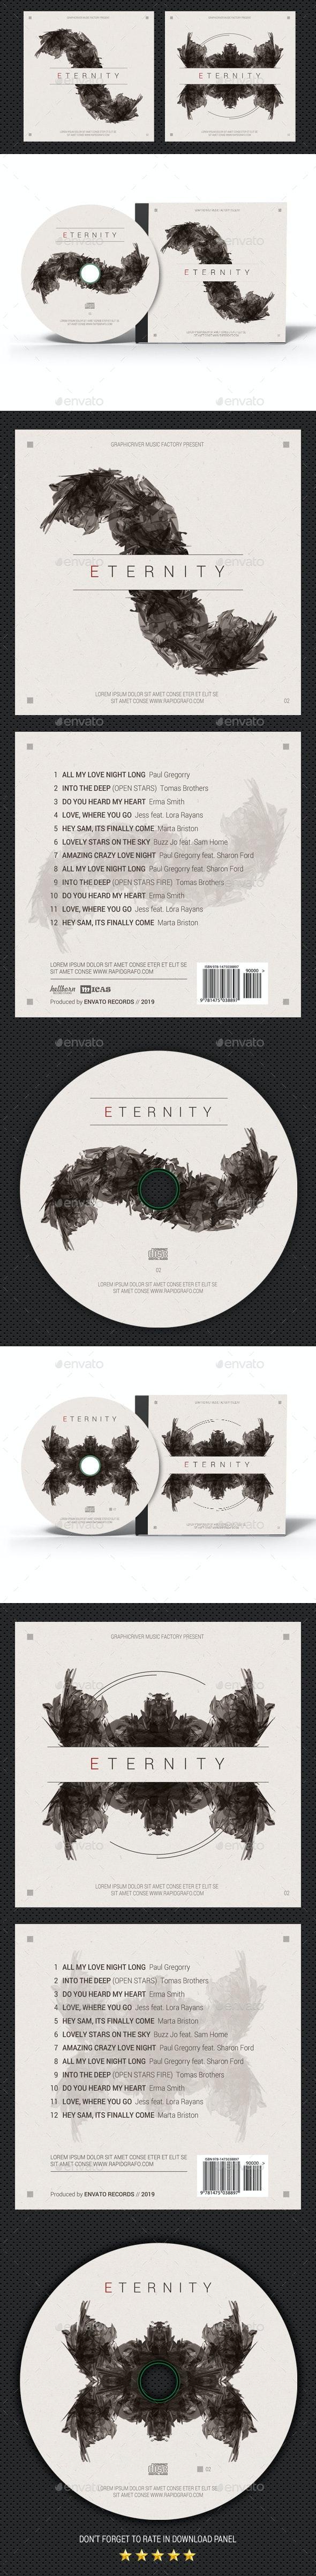 Eternity CD Cover - CD & DVD Artwork Print Templates